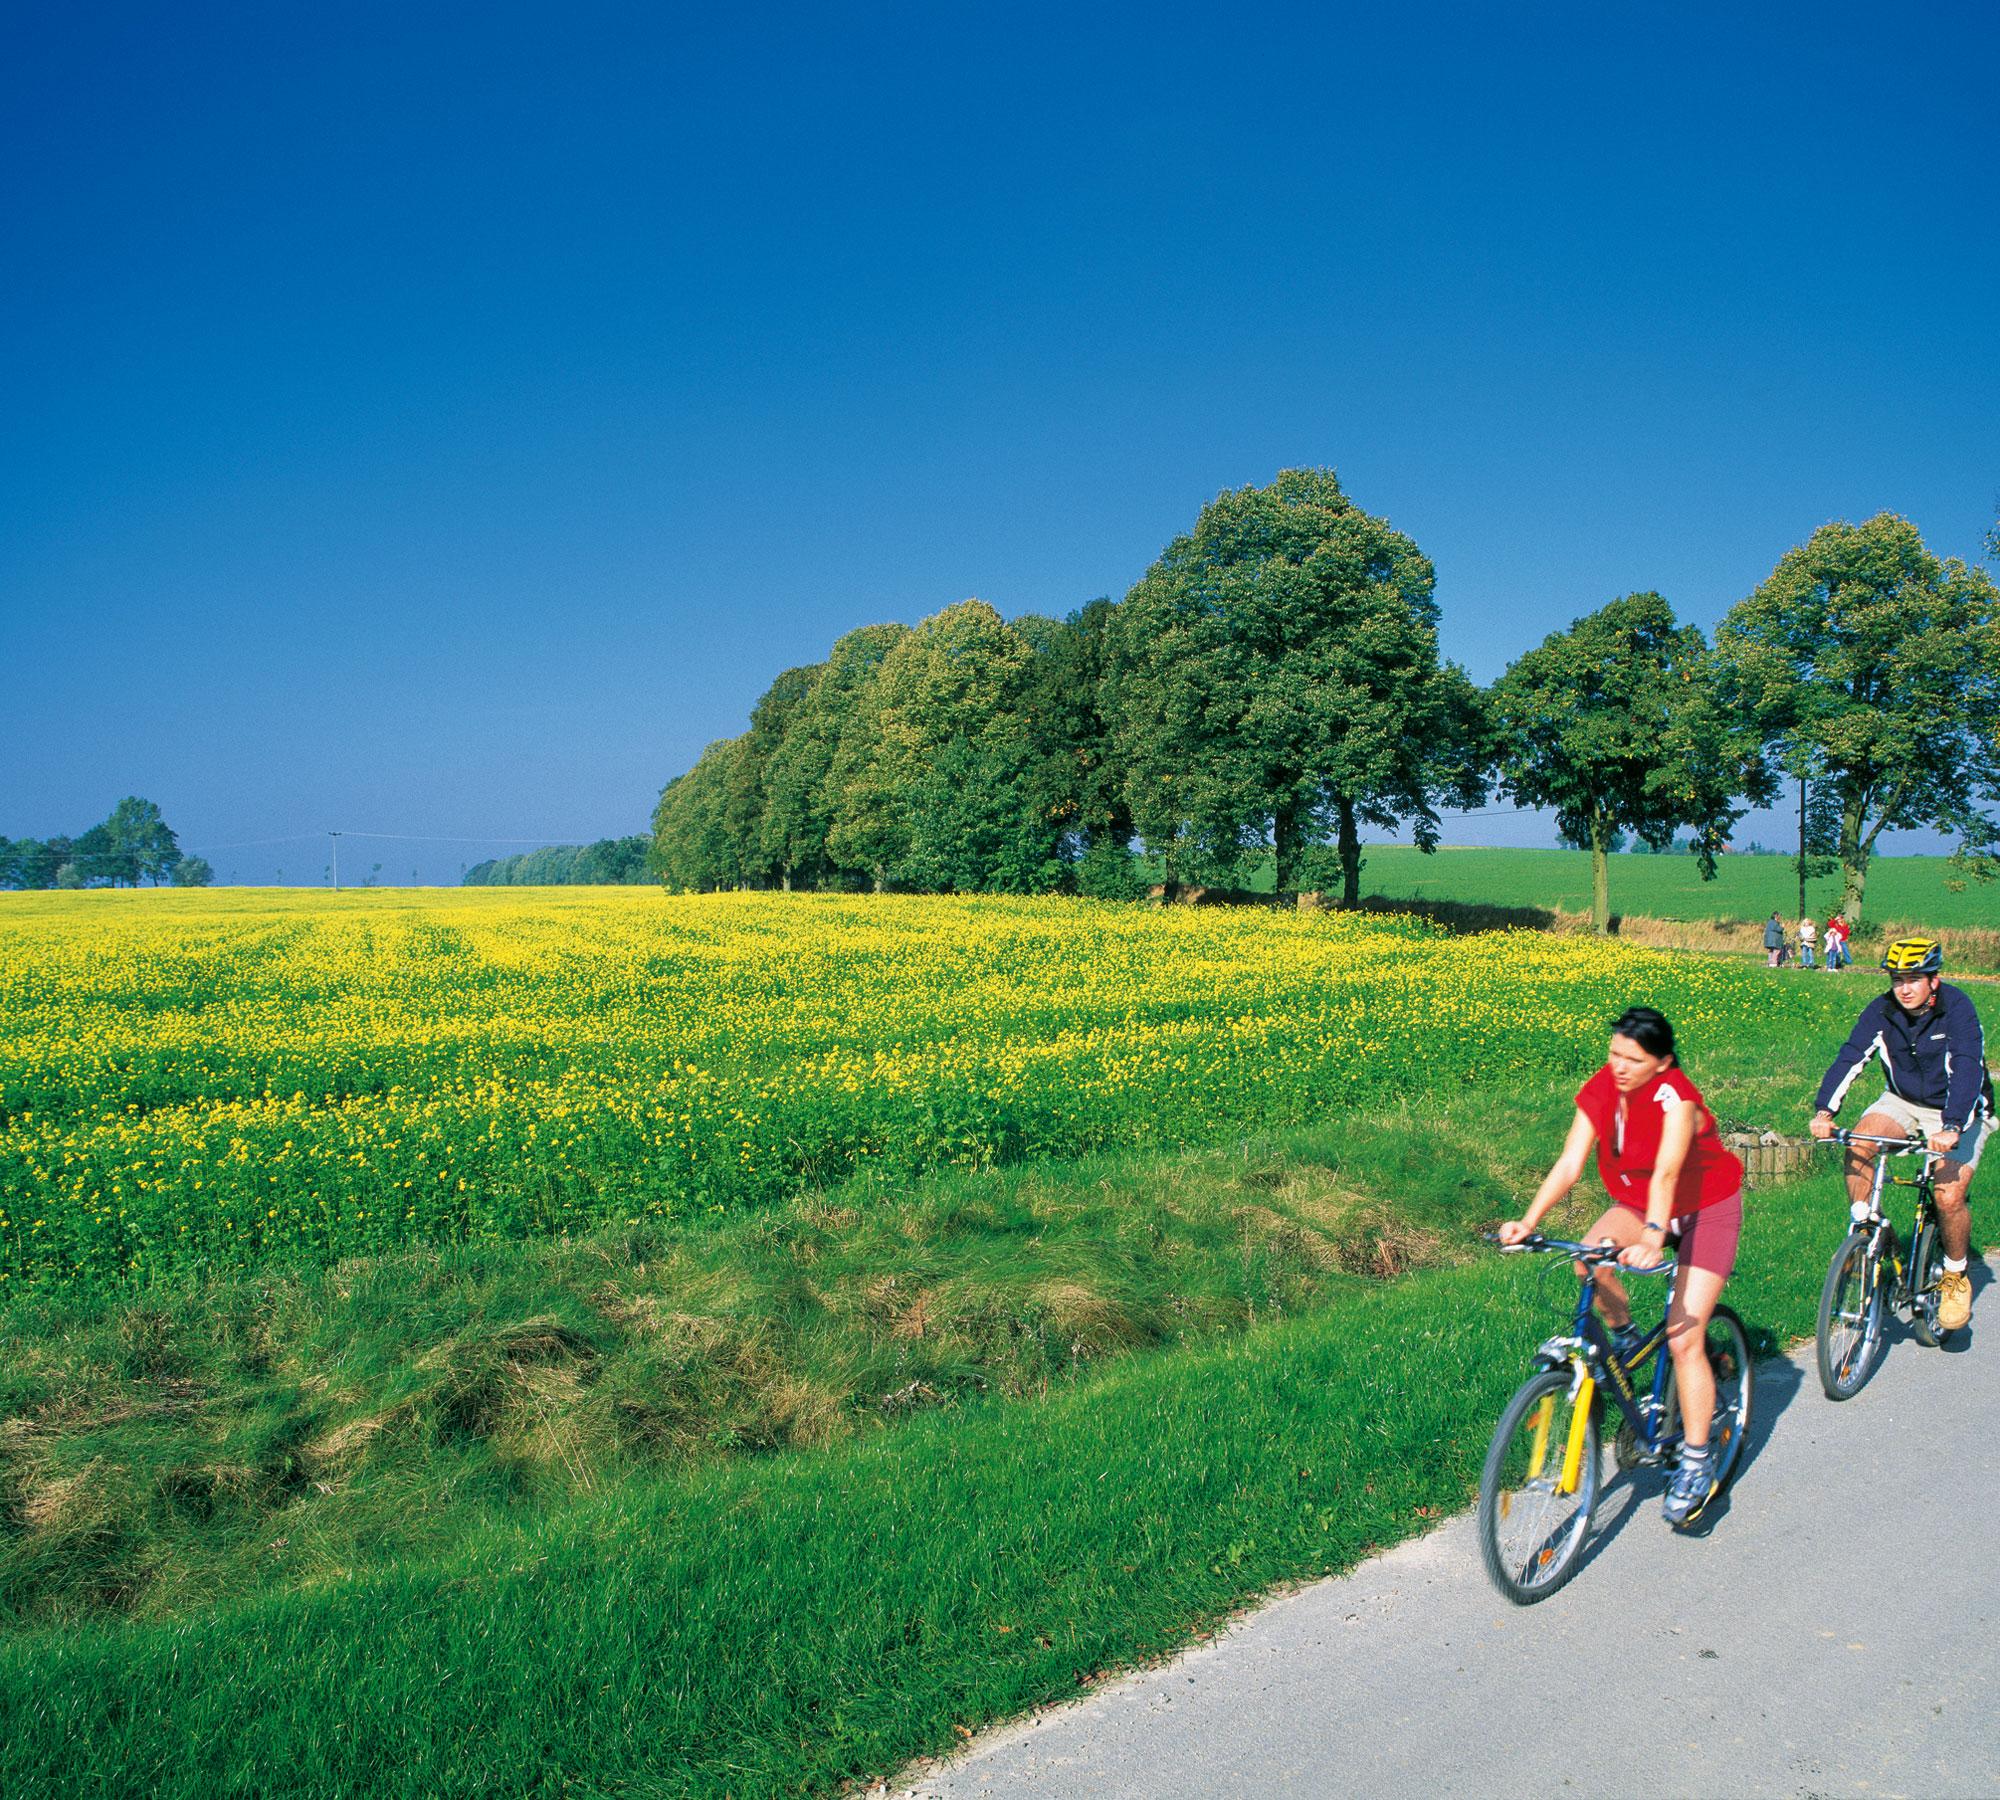 Auschnitt der Fahrradstrecke | HIMBEER Magazin